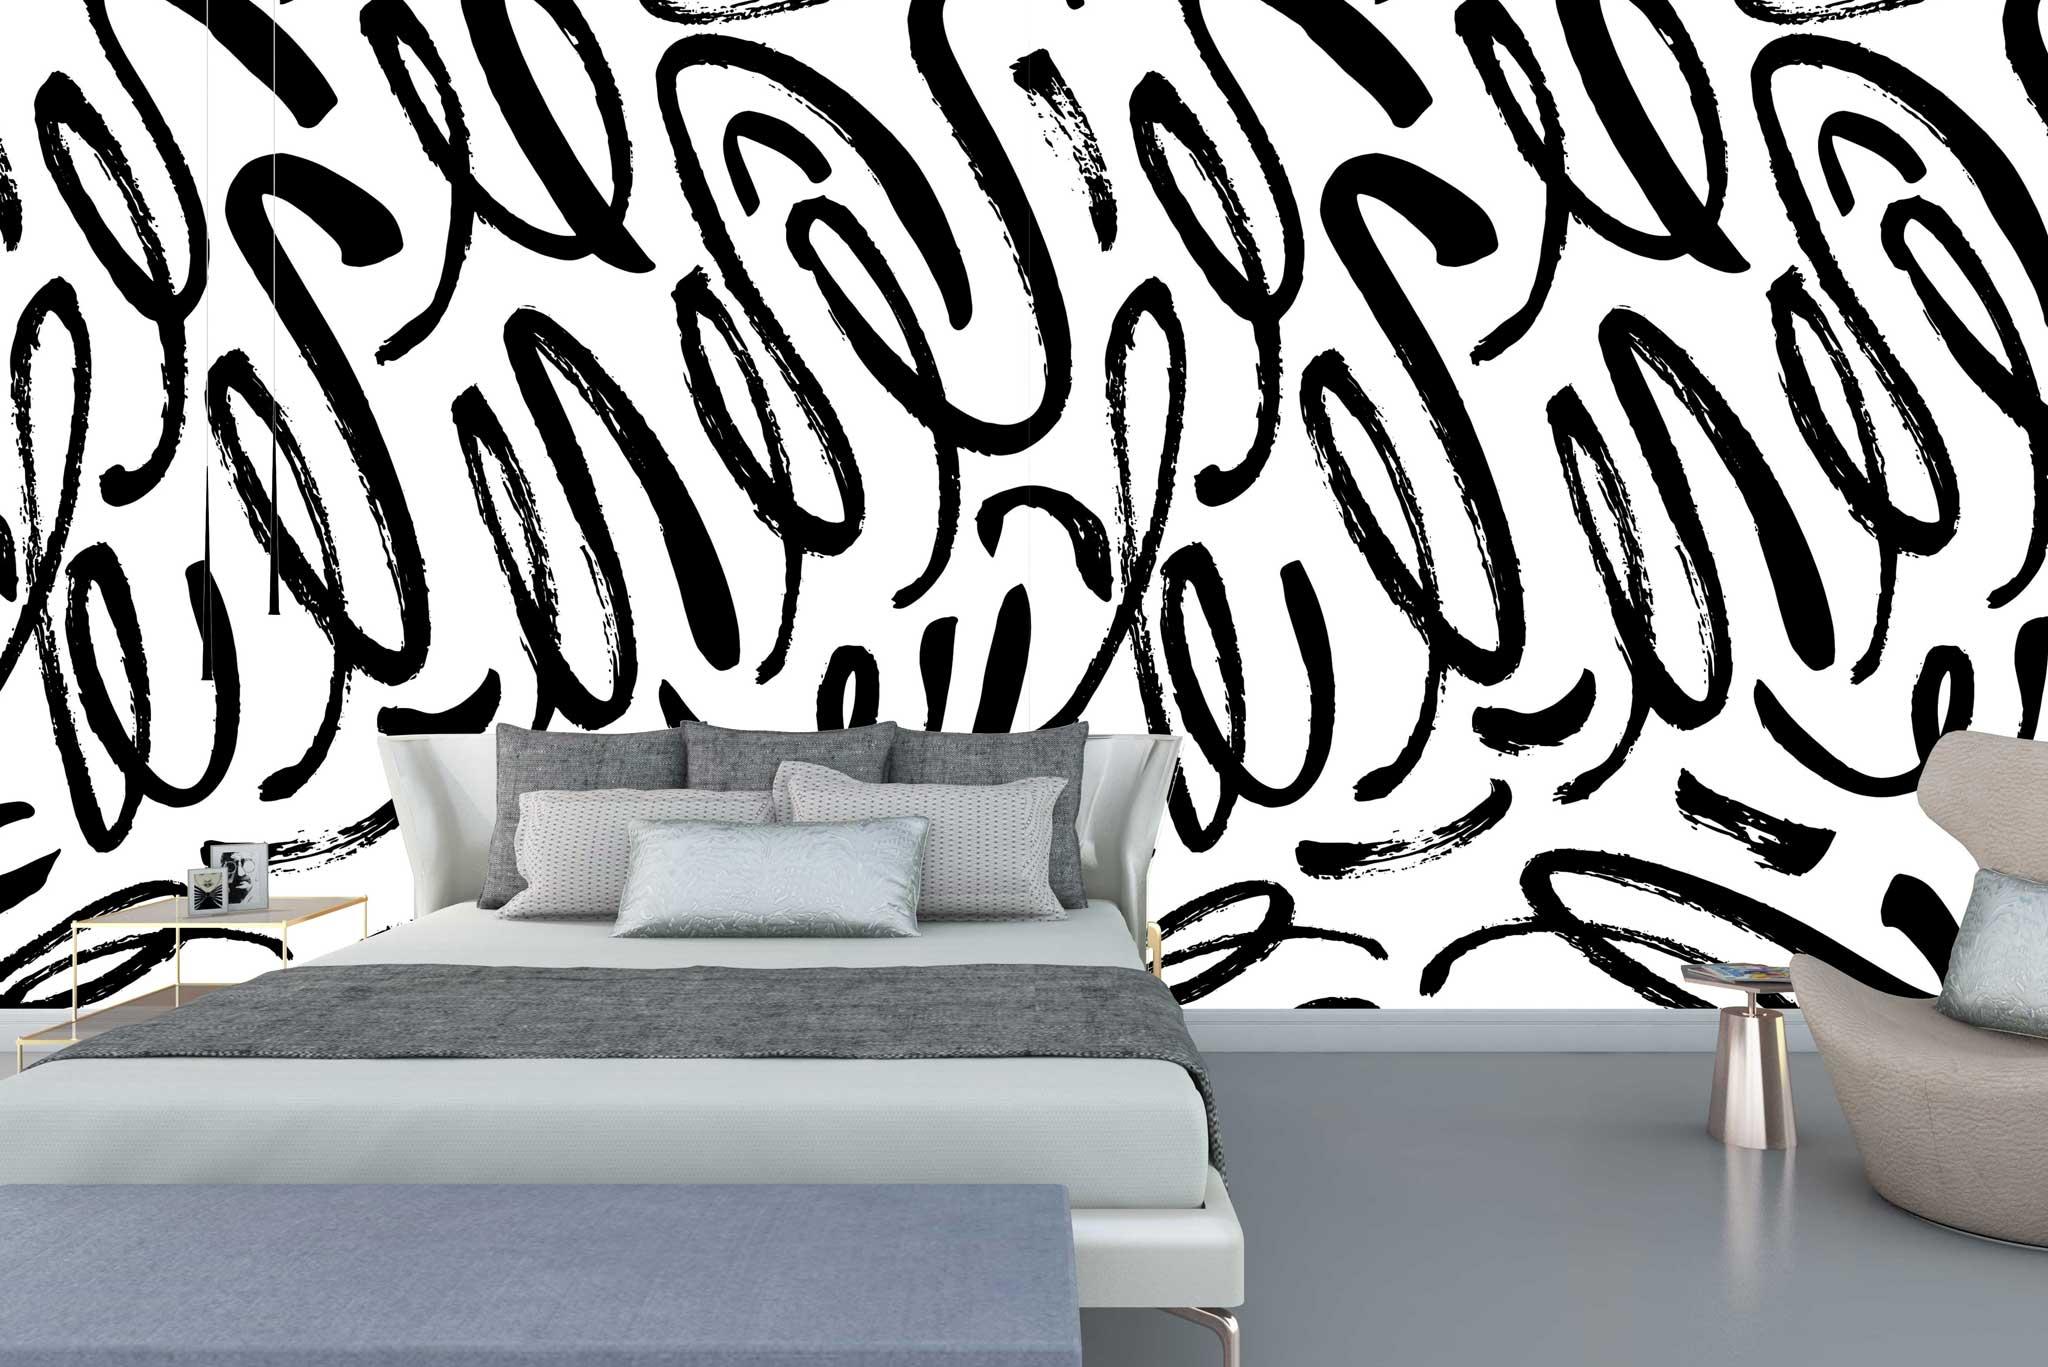 tapet-fototapet-comanda-personalizat-bucuresti-perete-special-lux-model-desen-grafic-alb-negru